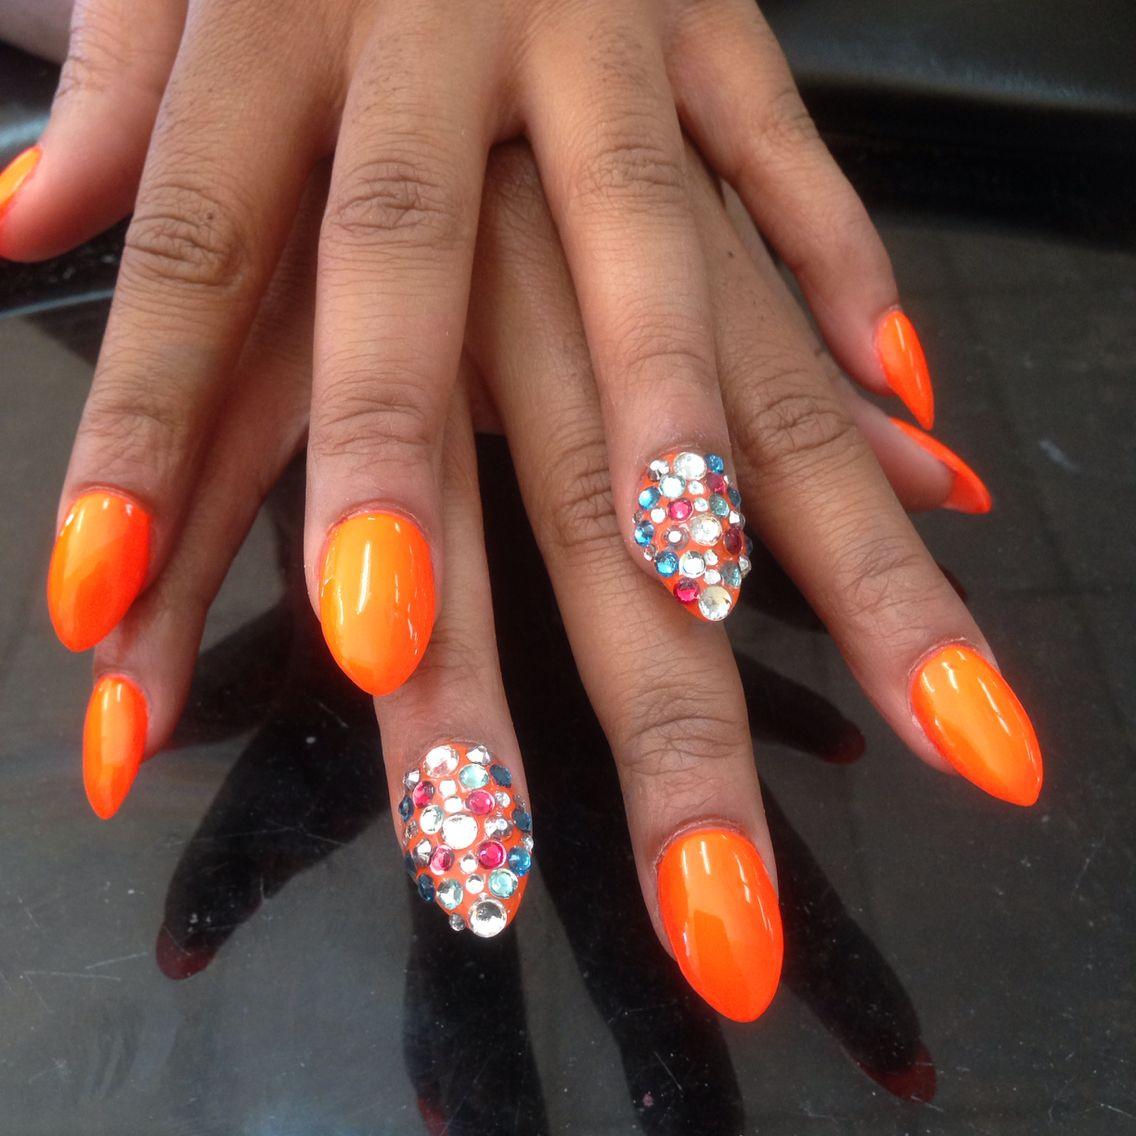 Orange rhinestone nail design acrylic nail pinterest orange rhinestone nail design prinsesfo Gallery